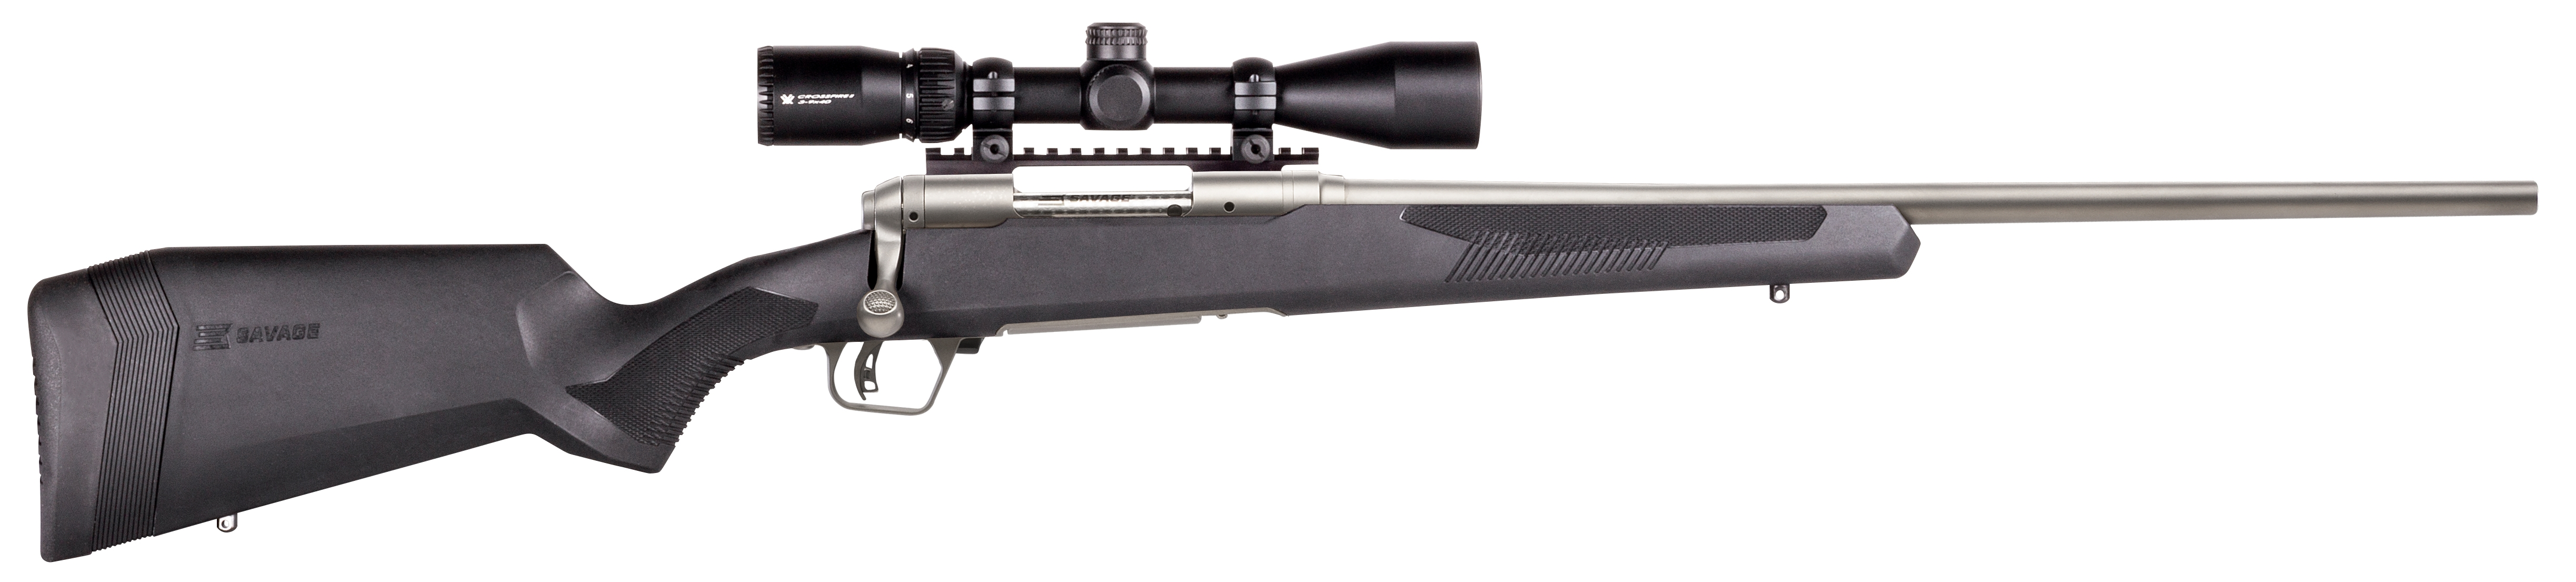 Savage Arms 110 Apex Storm XP 243 Win